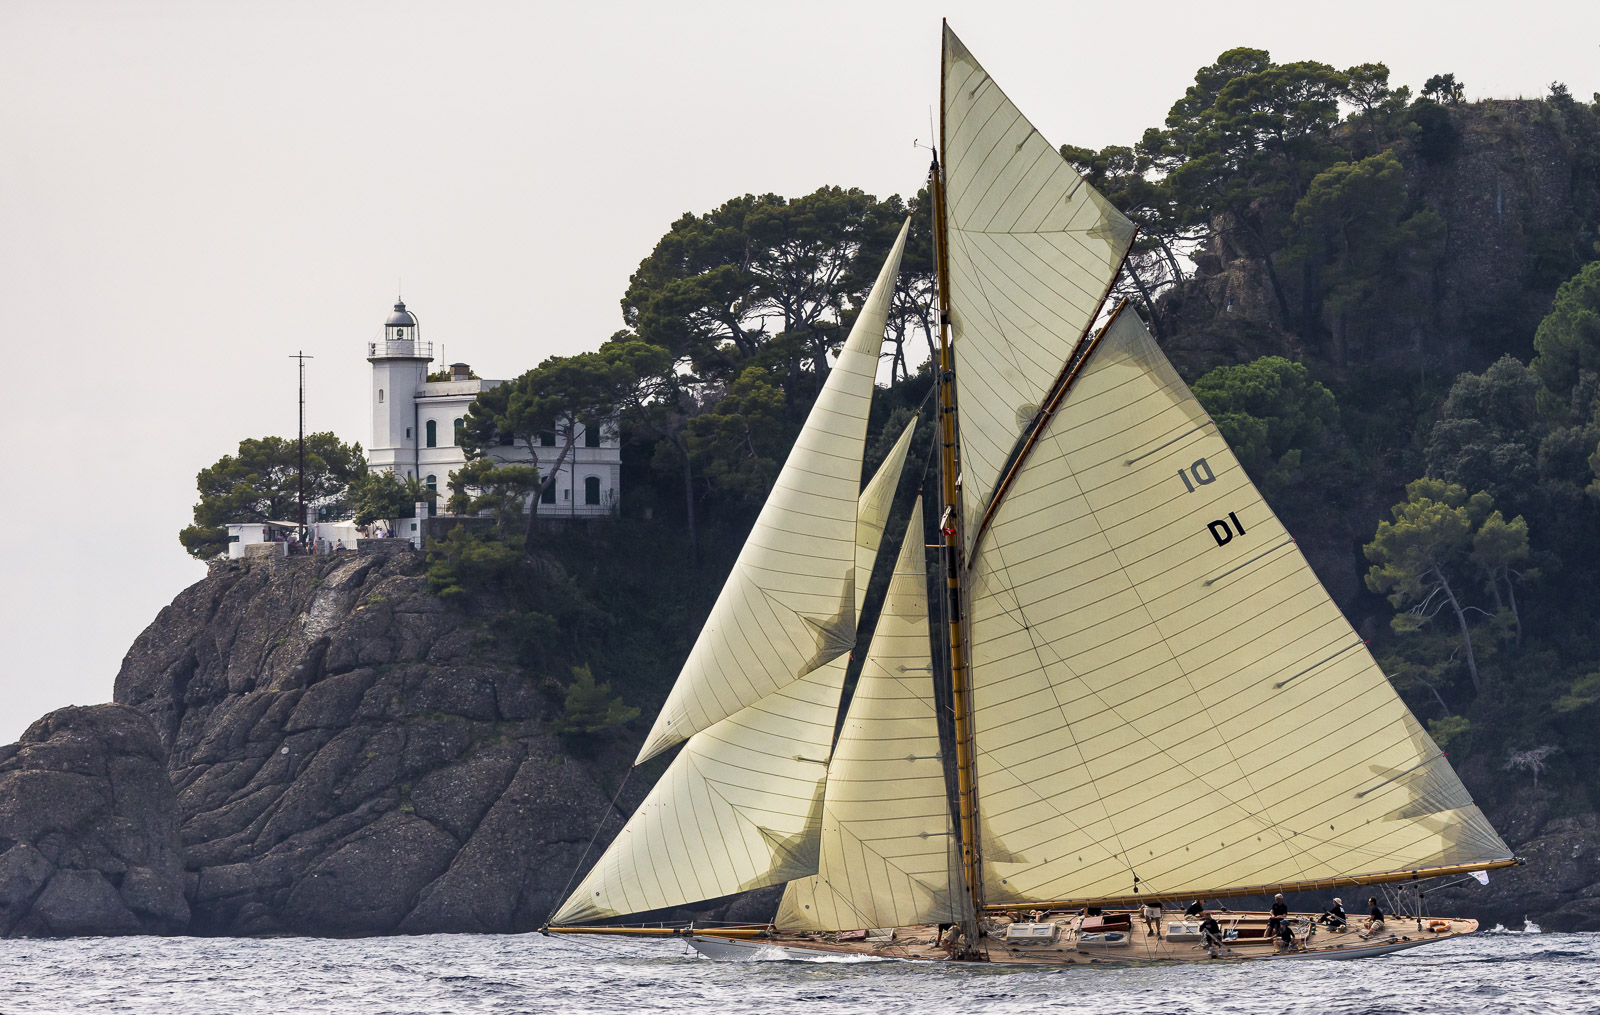 MARISKA, Sail n: D1, Owner: Christian Niels, Boat Type: 15 Metre